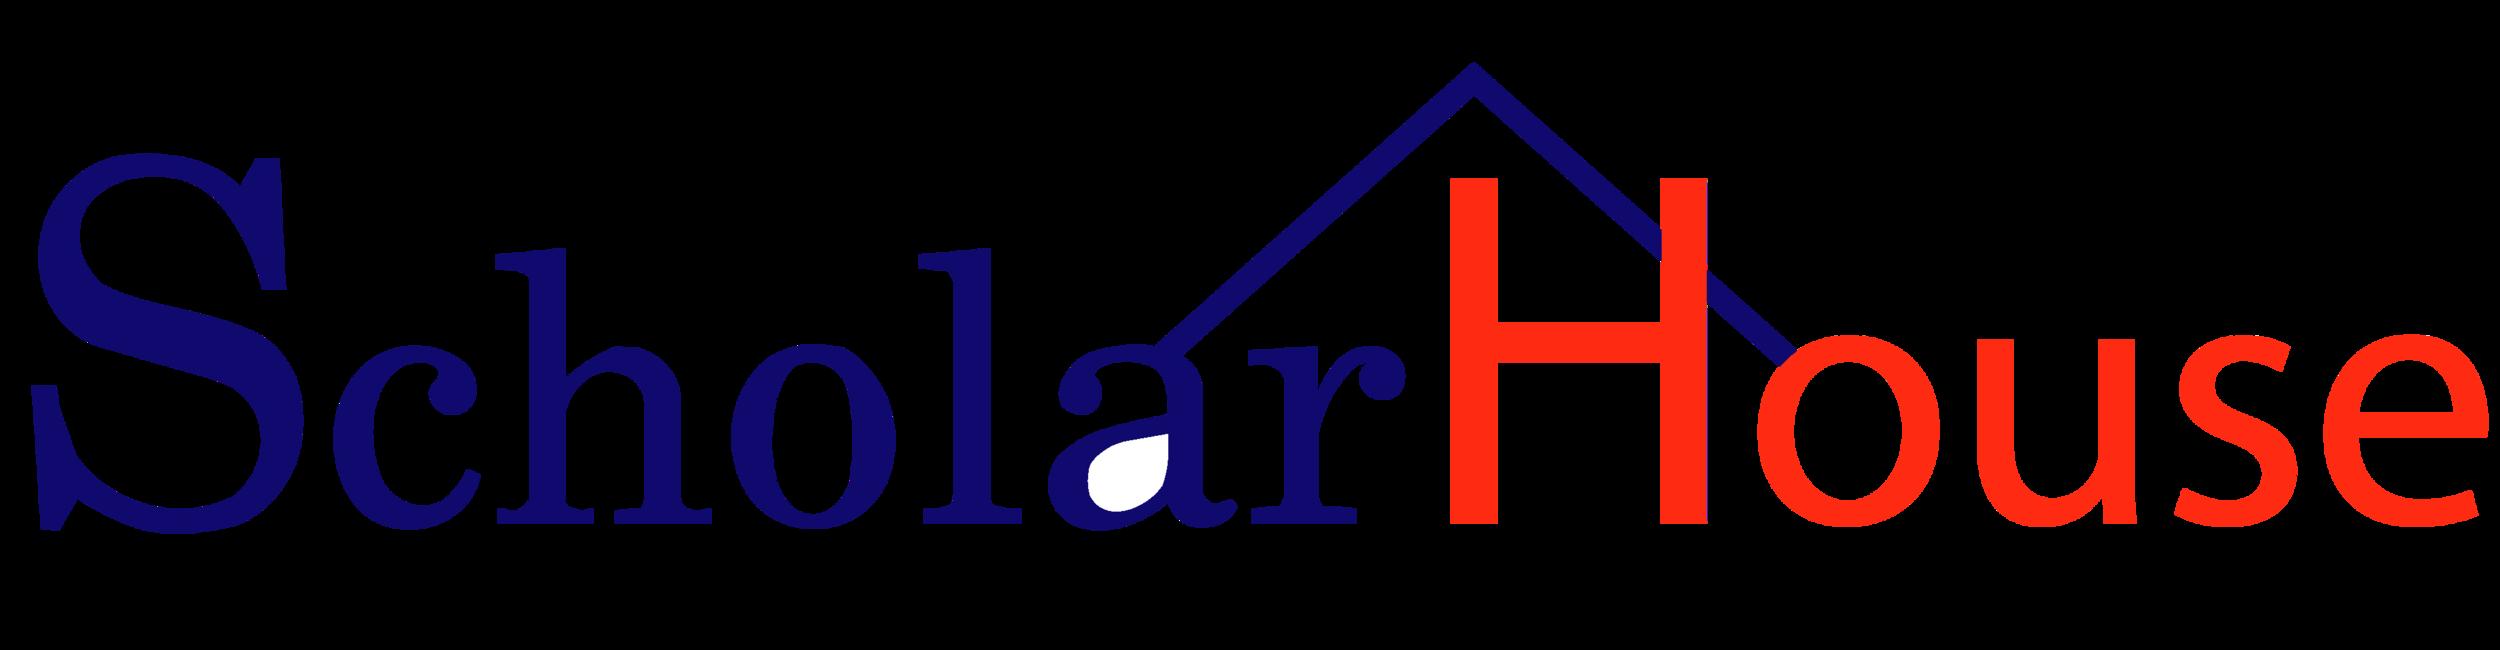 scholarhouse_logo.png